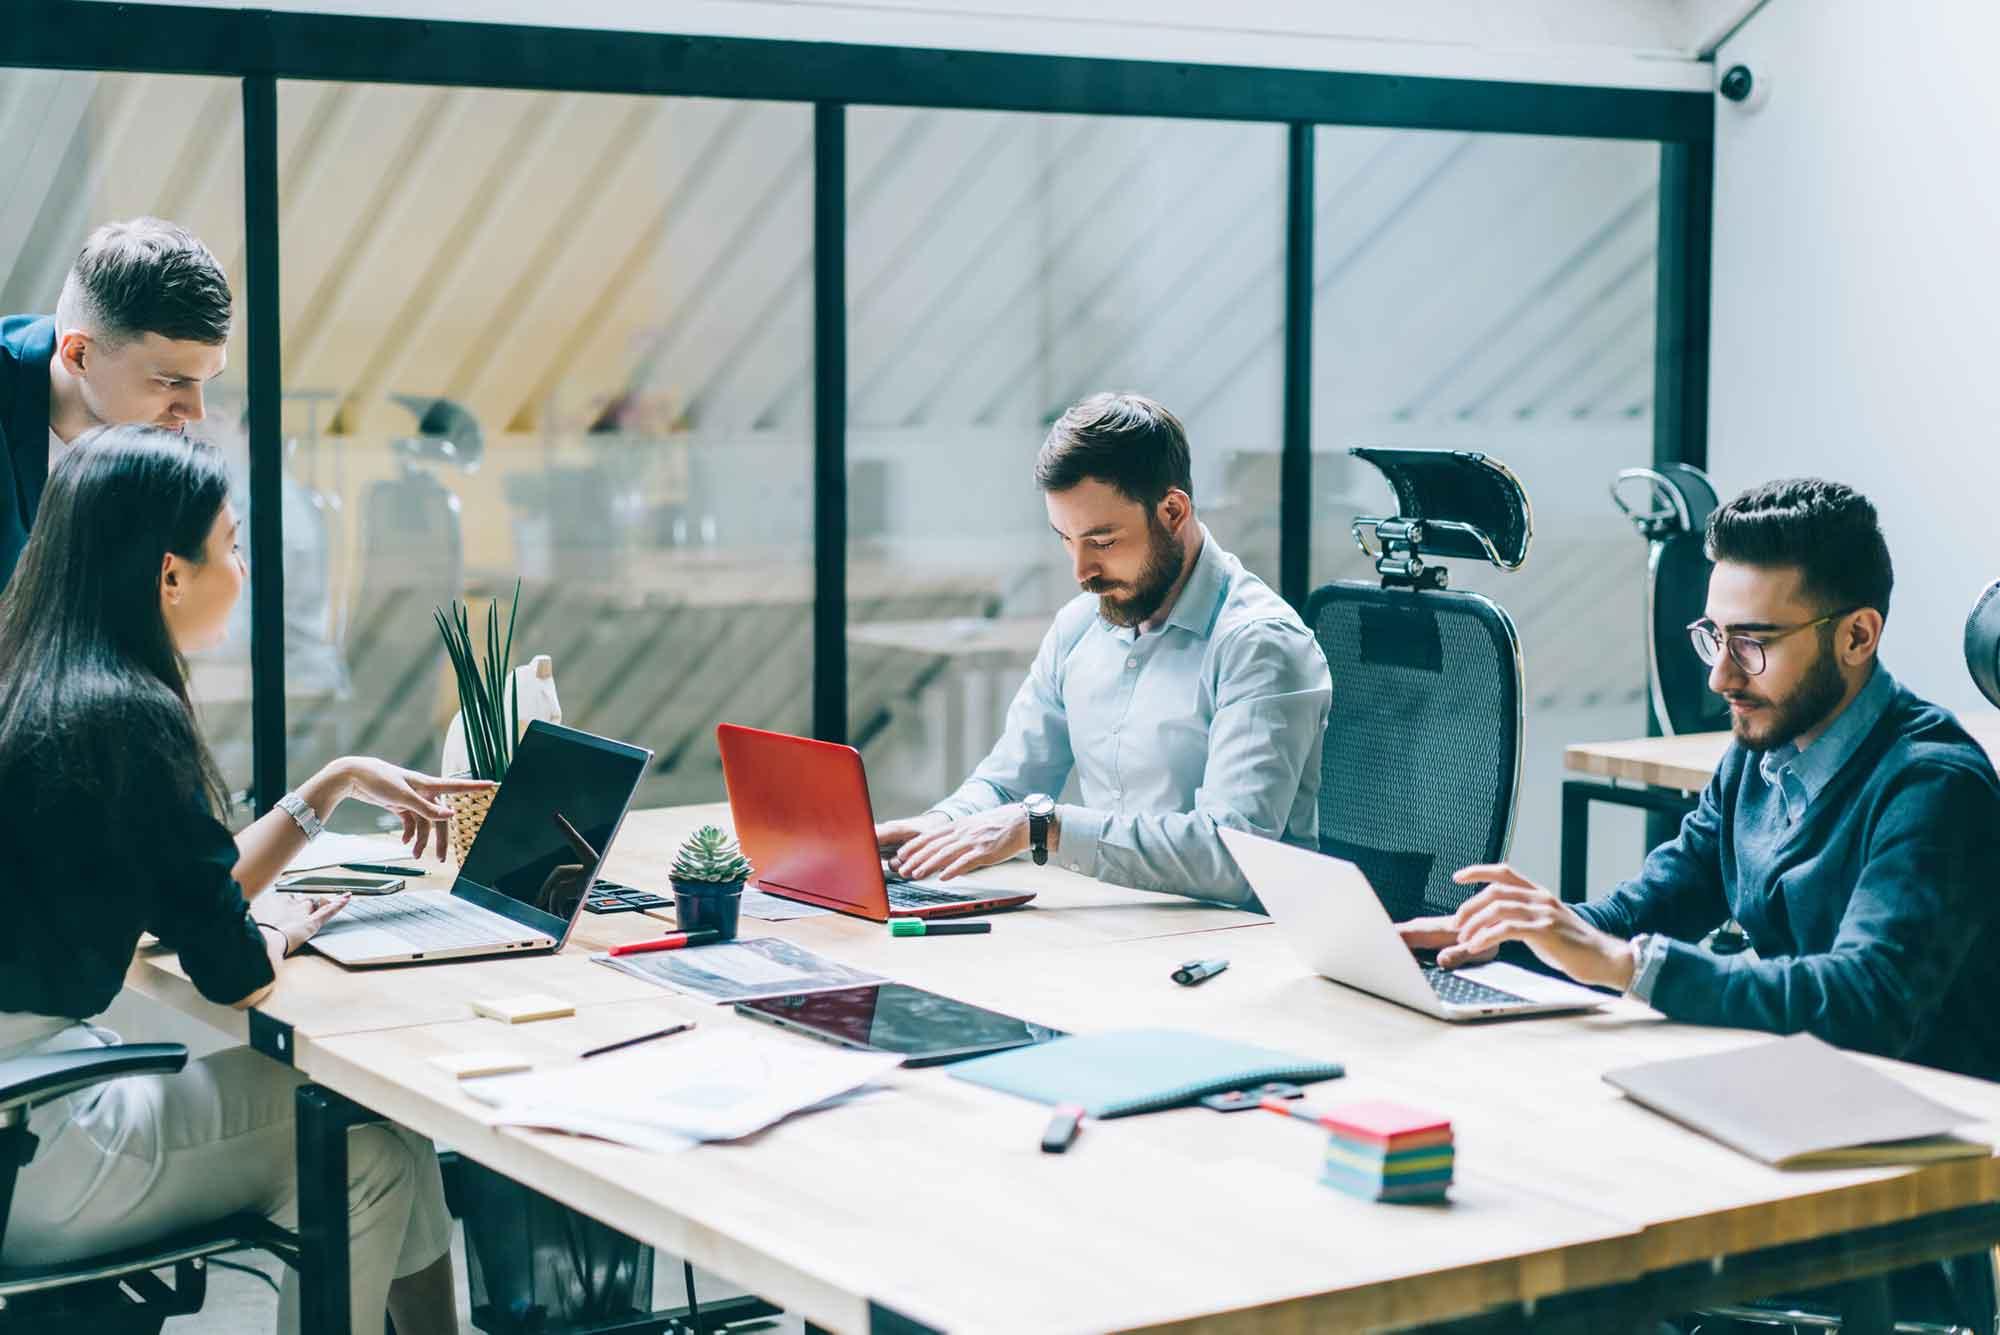 Team members working on laptops in an office.